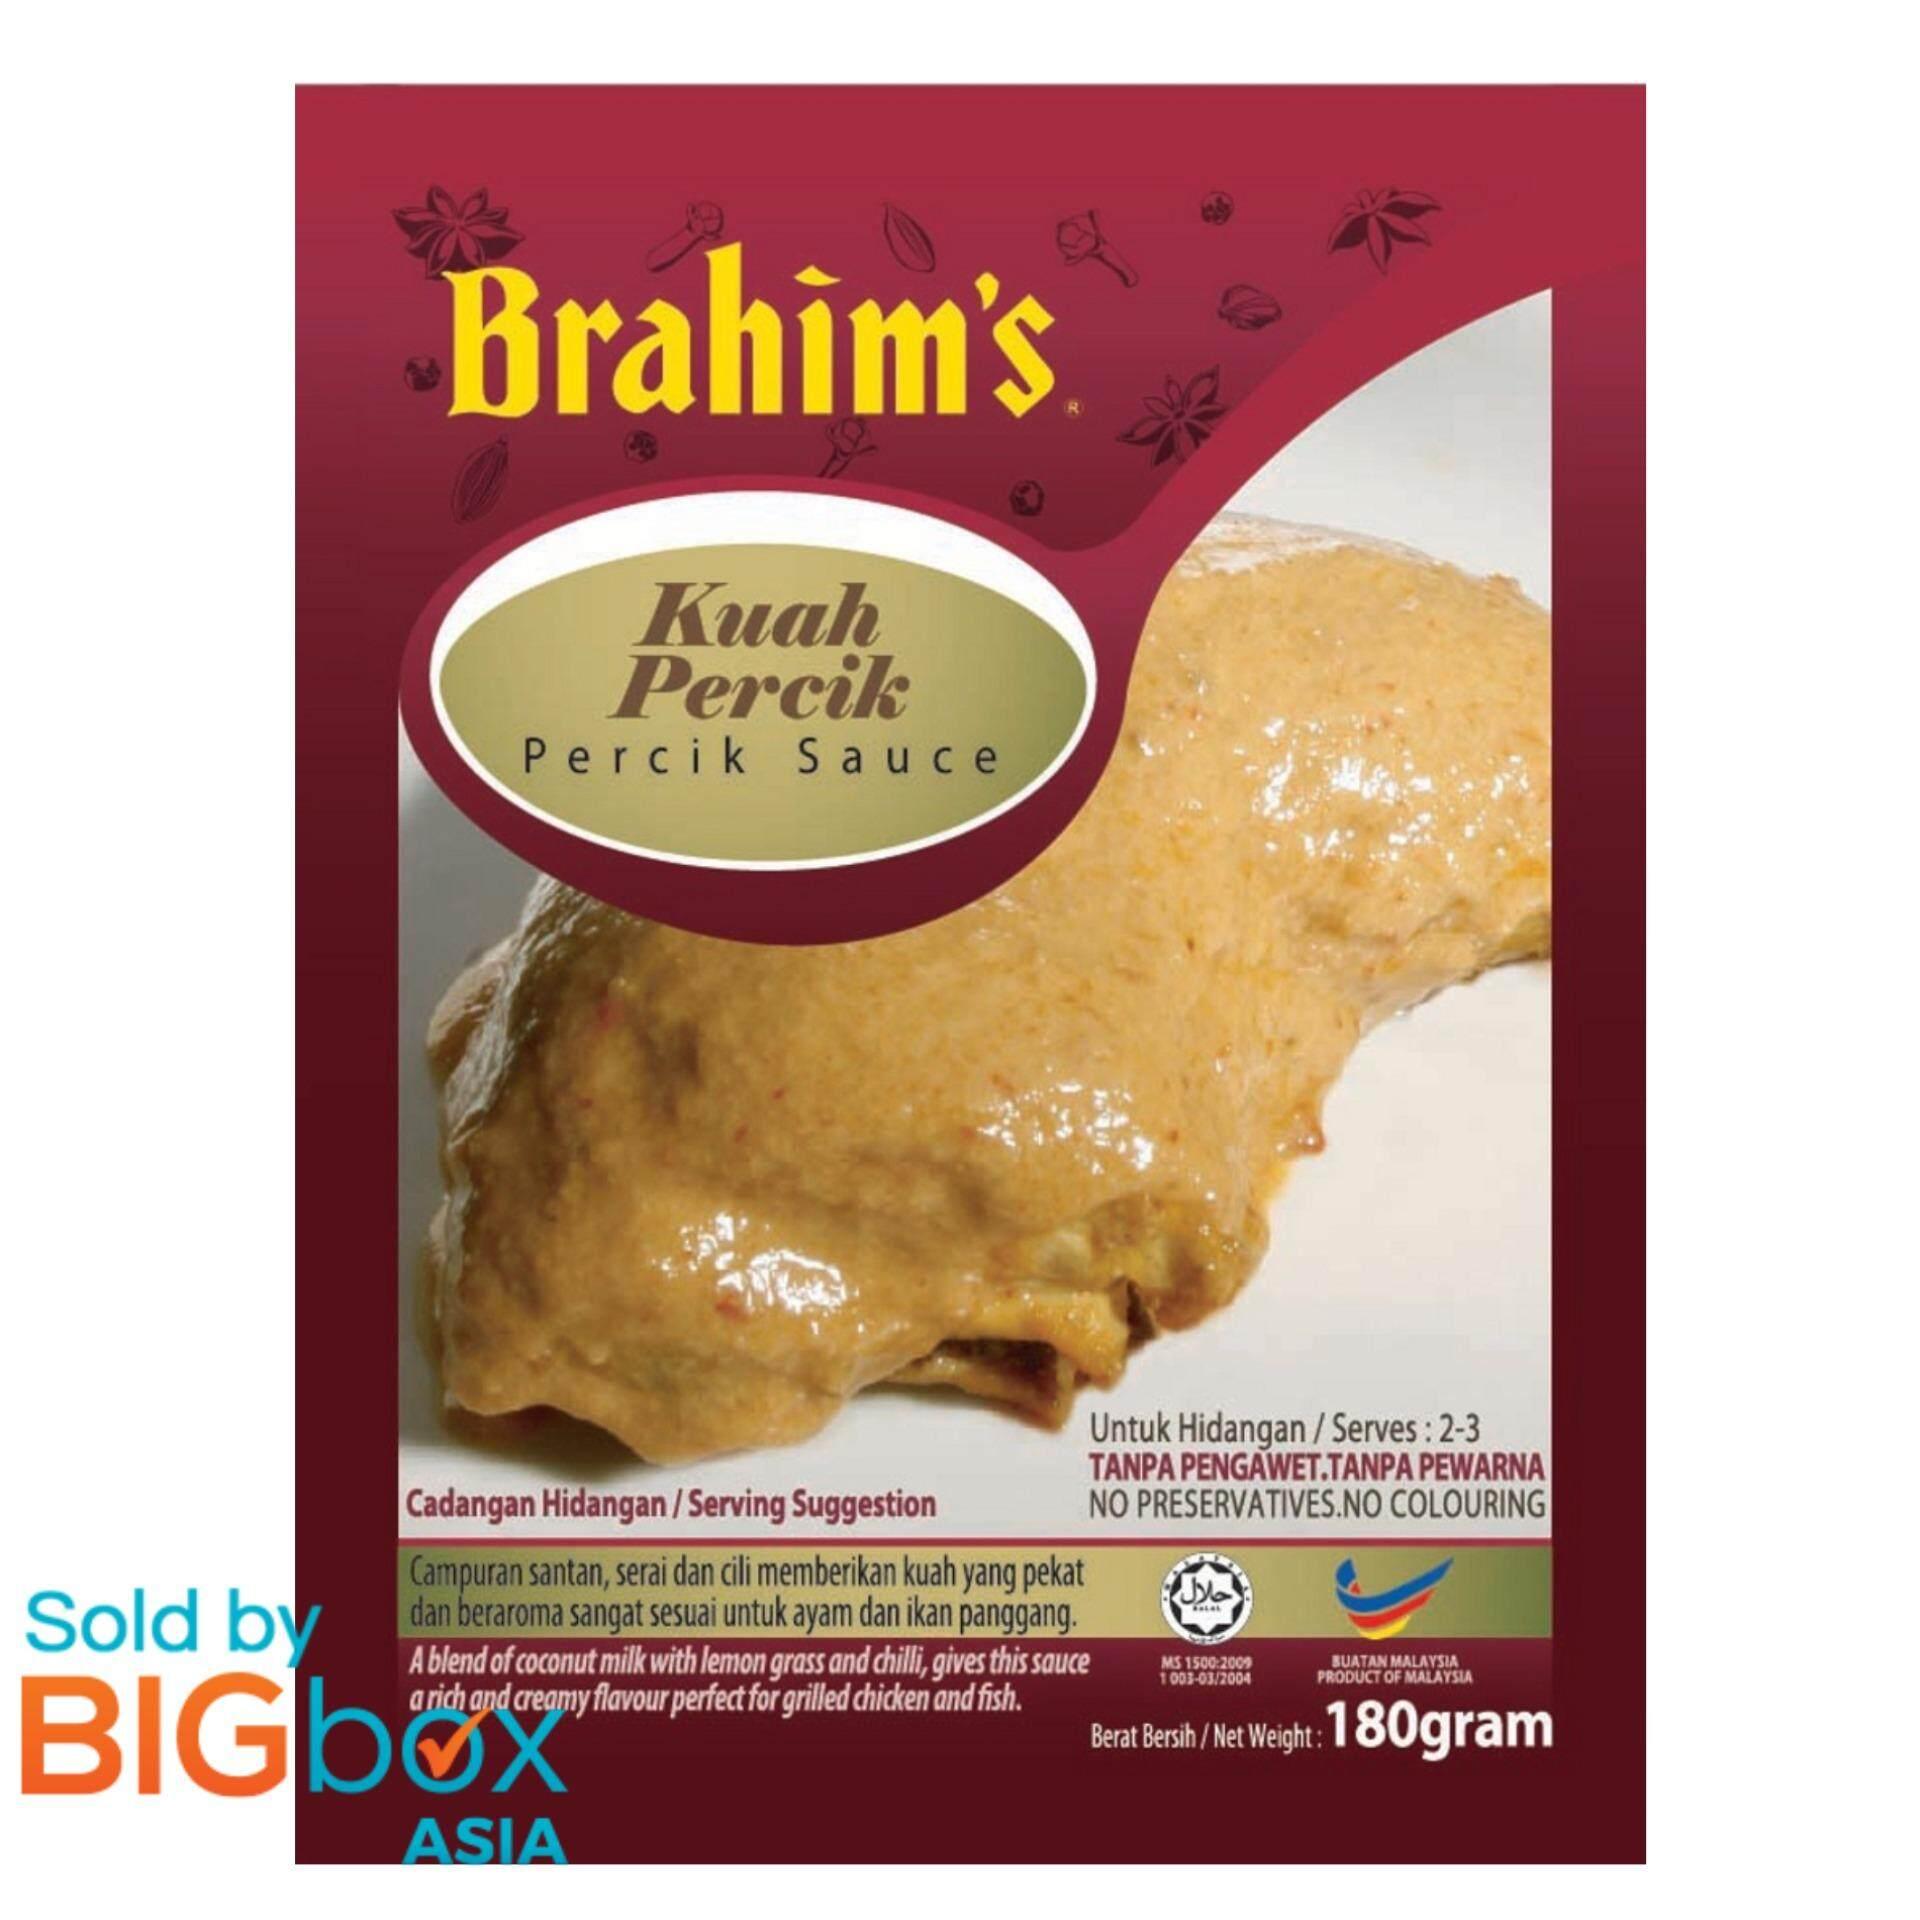 [BIGBox Asia] Brahim's Ready To Use Percik Sauce180g - Malaysia